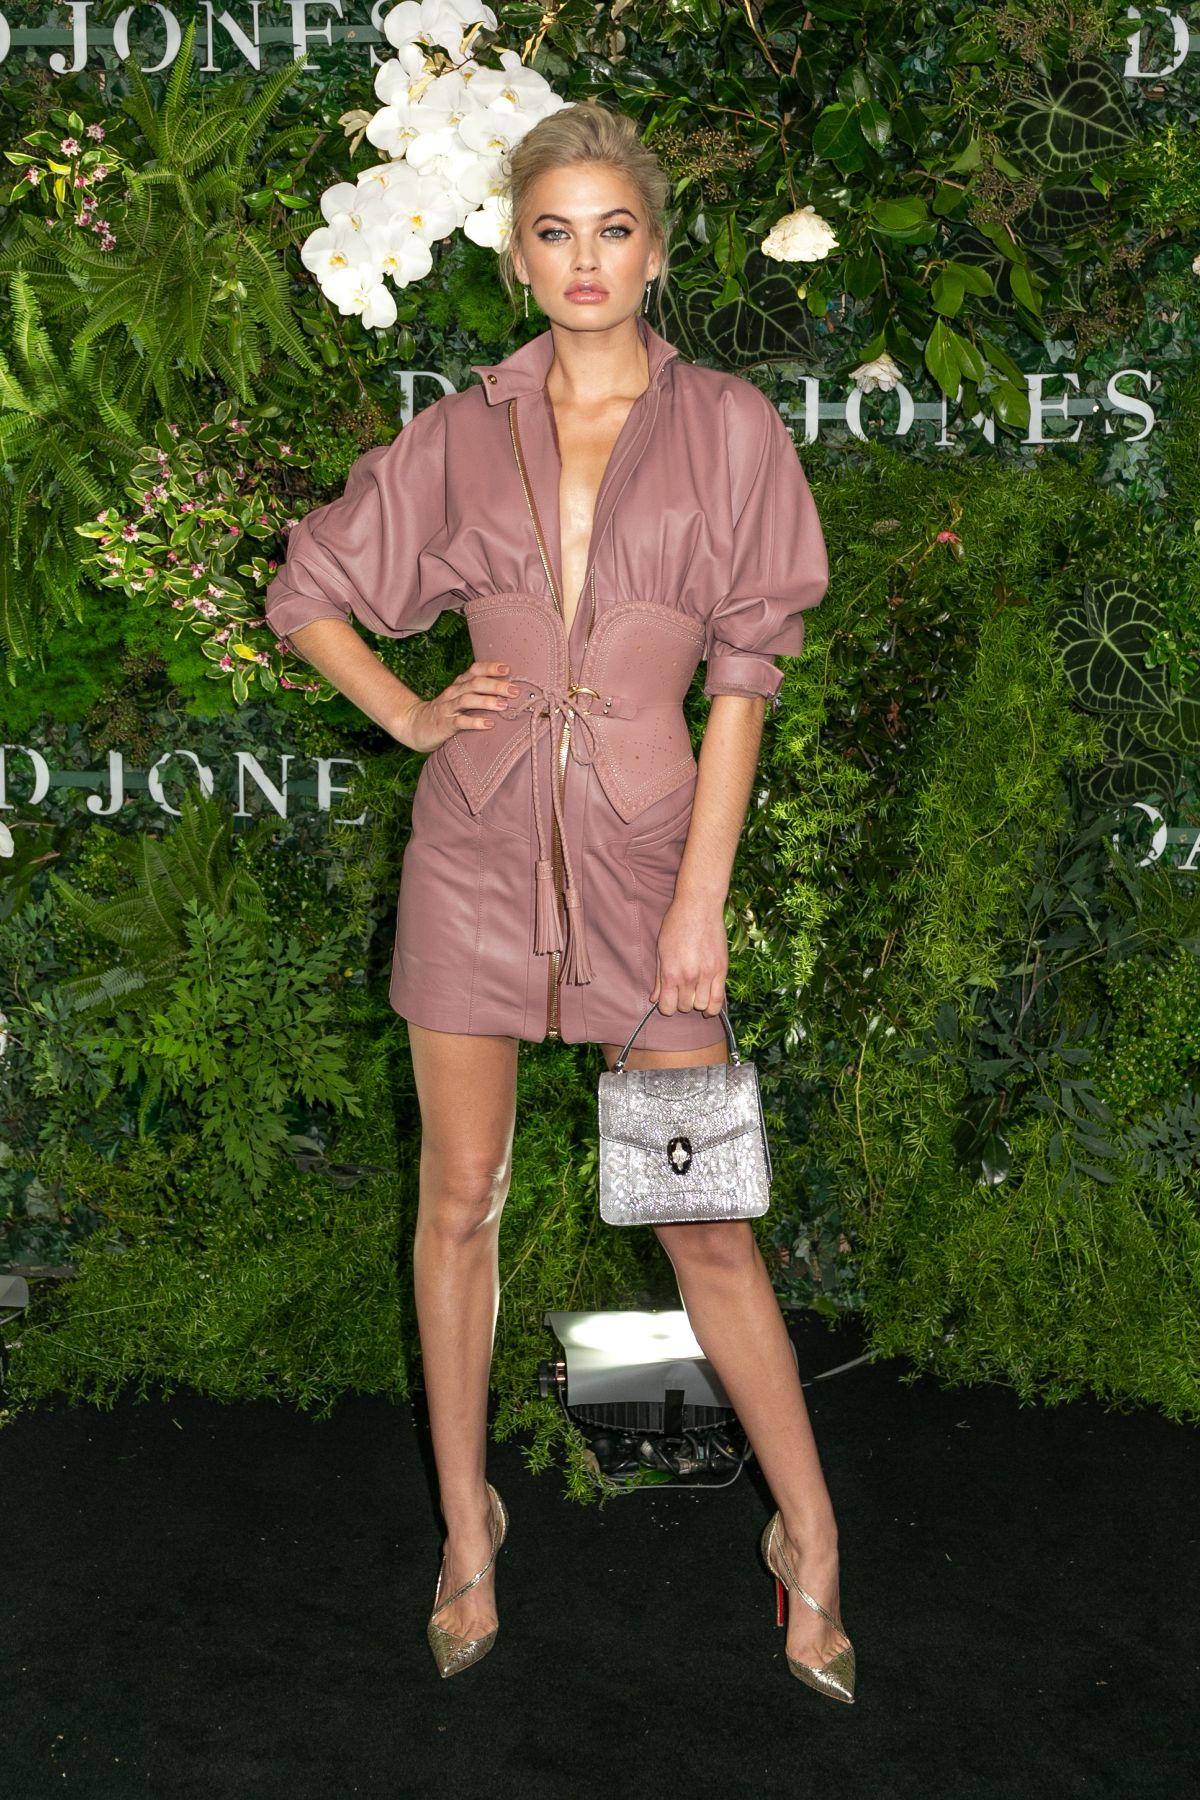 TIARNIE COUPLAND at David Jones Spring/Summer 2018 Fashion